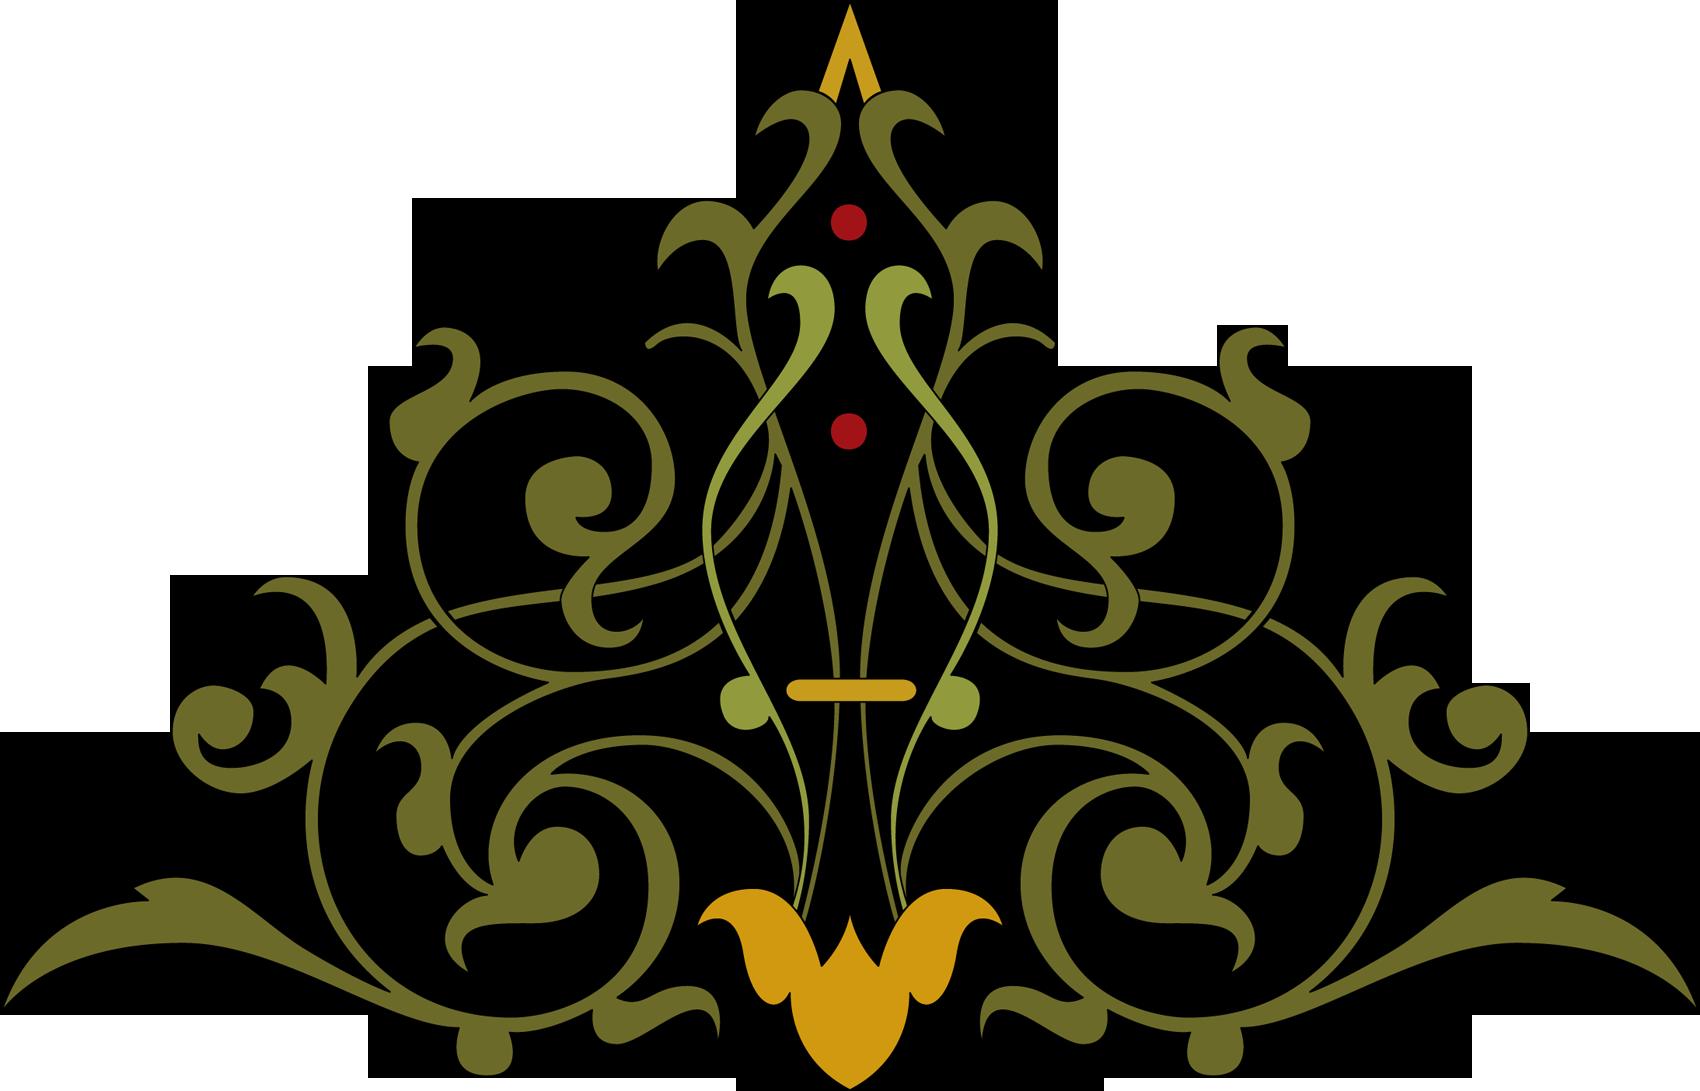 Lenagold - Клипарт - Виньетки и завитушки 3: lenagold.ru/fon/clipart/v/vin3.html